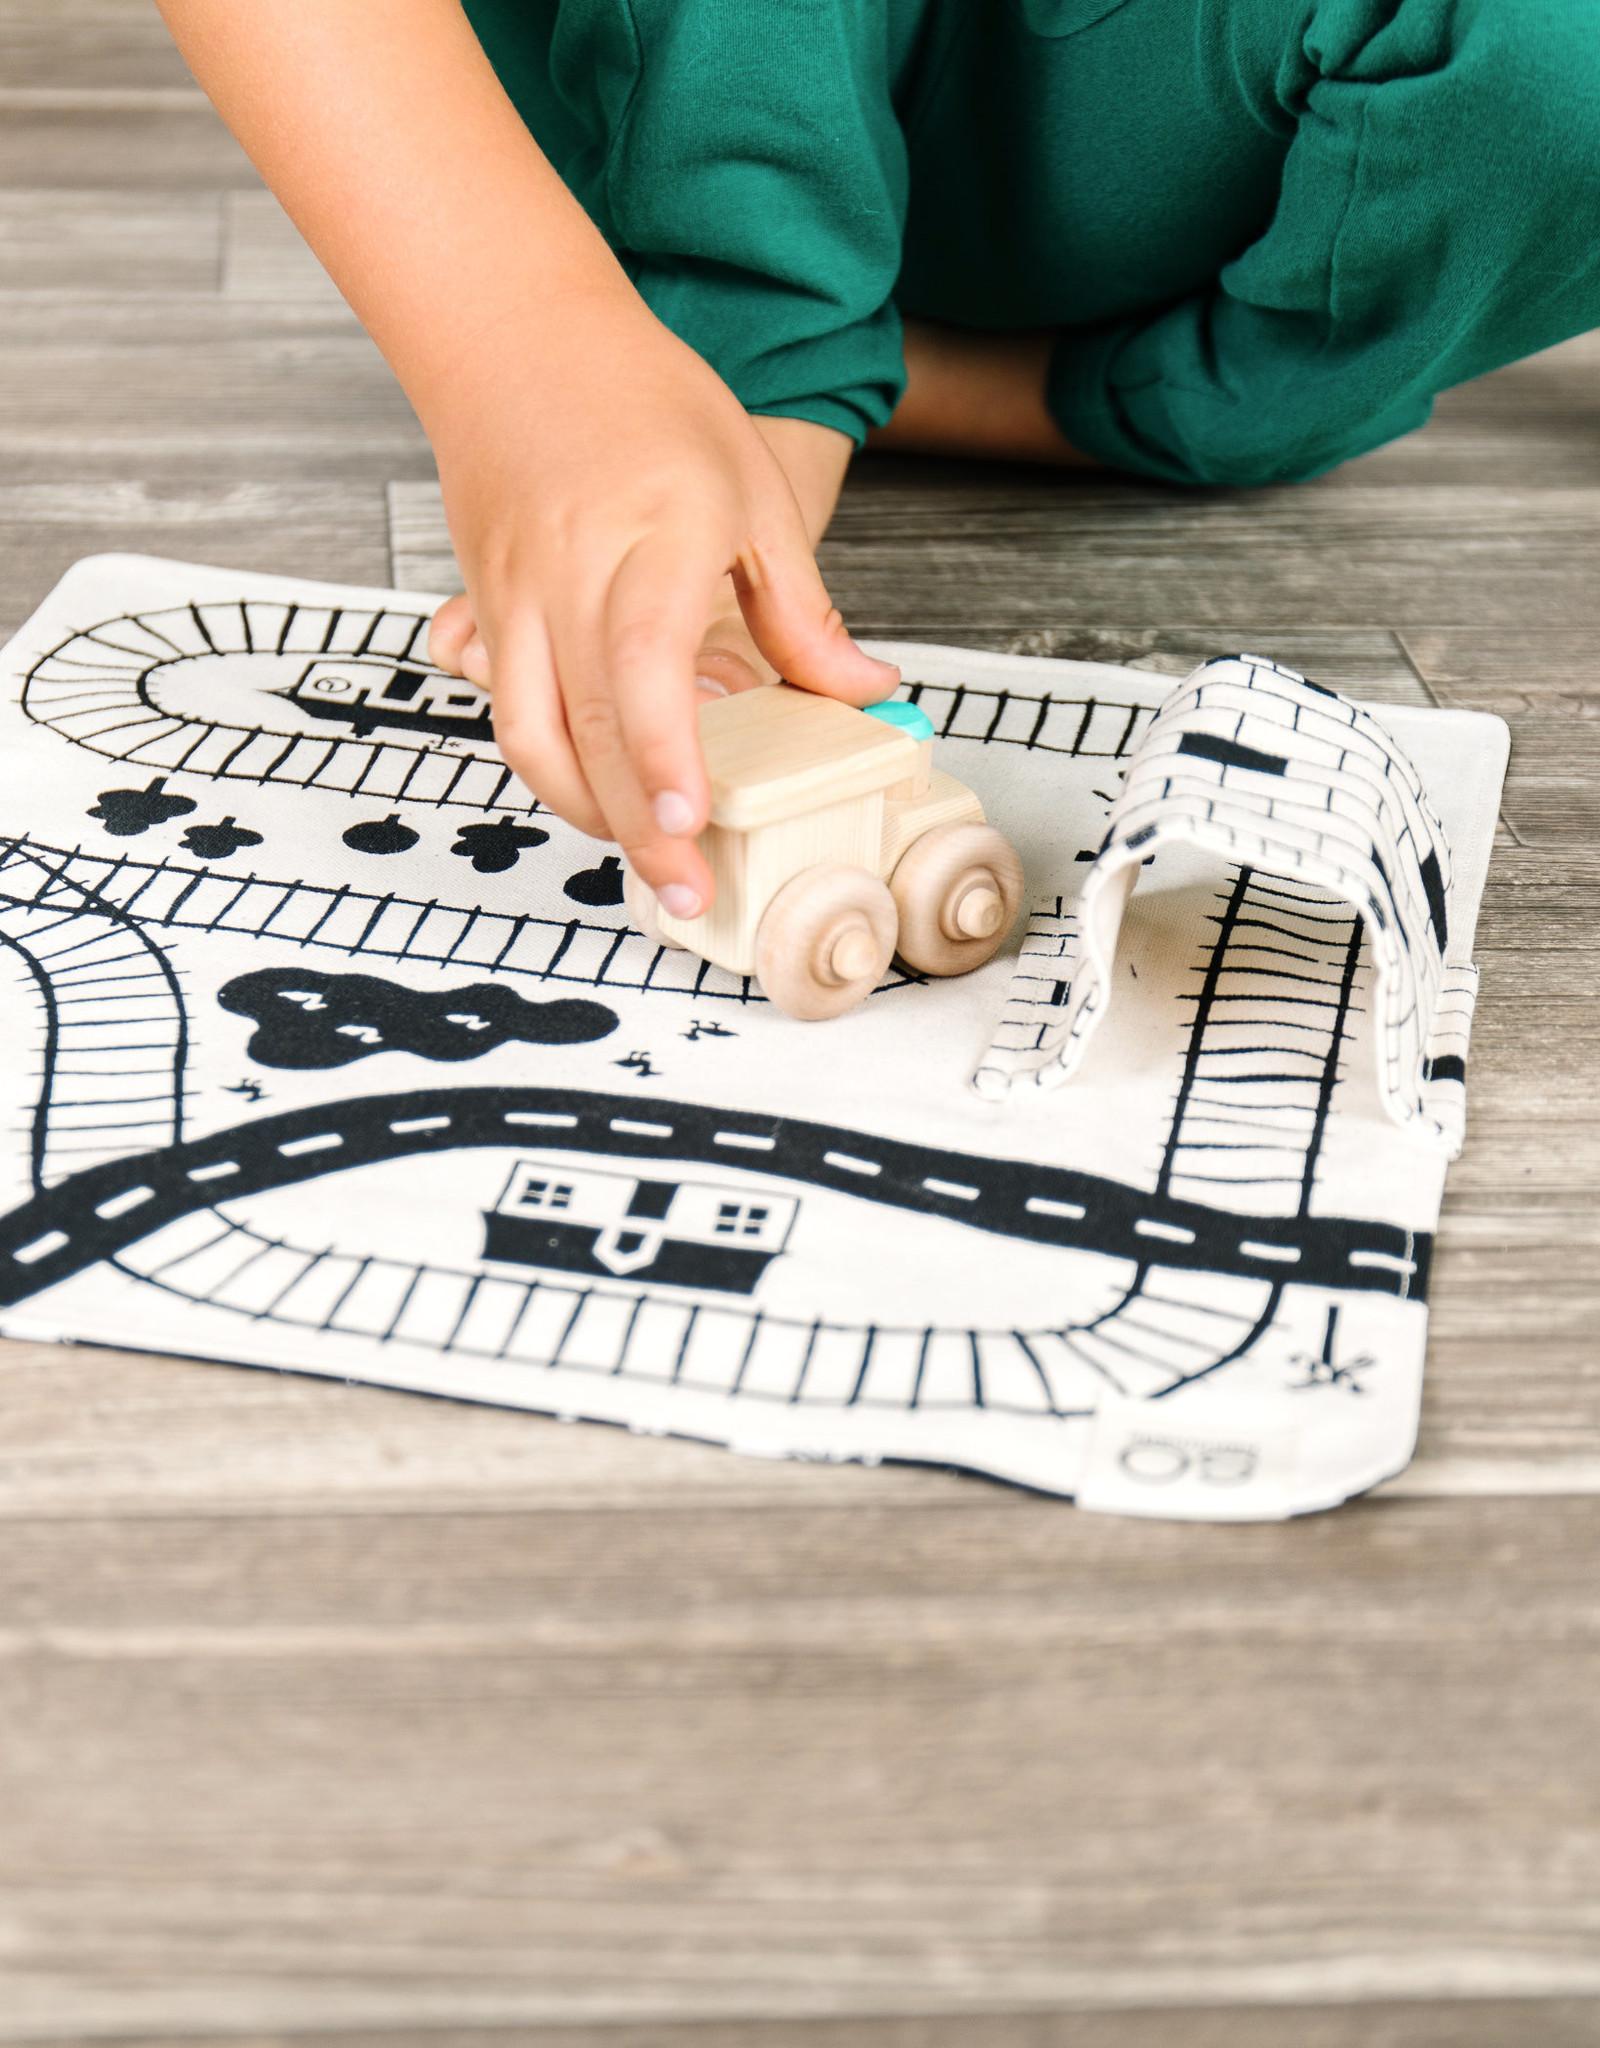 So Handmade Organic Train Playmat with Wooden Train